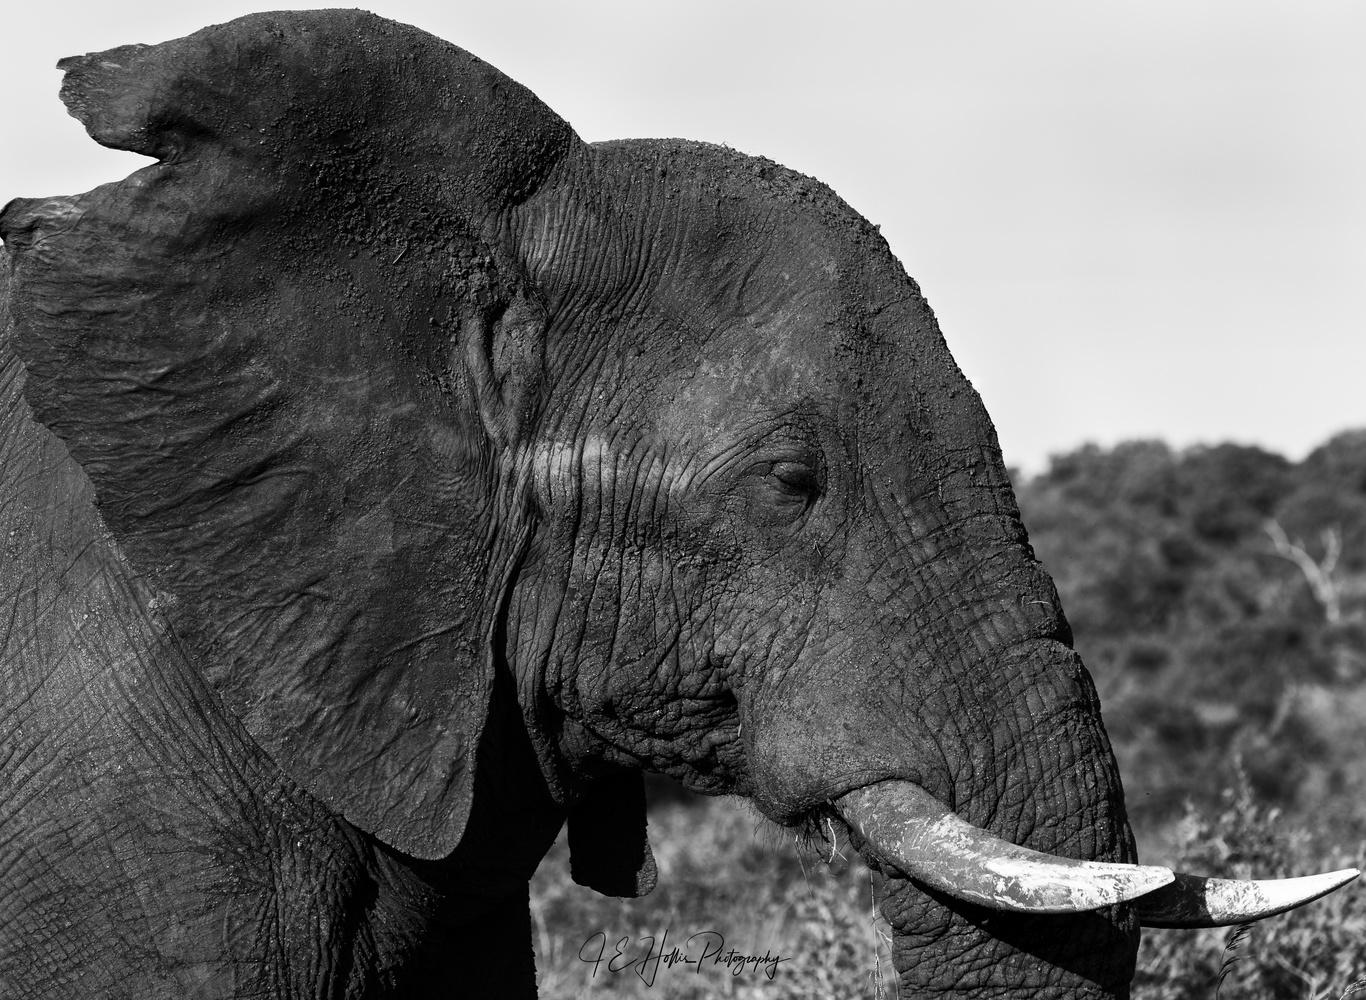 Elephant Profile in B&W by J Hollis